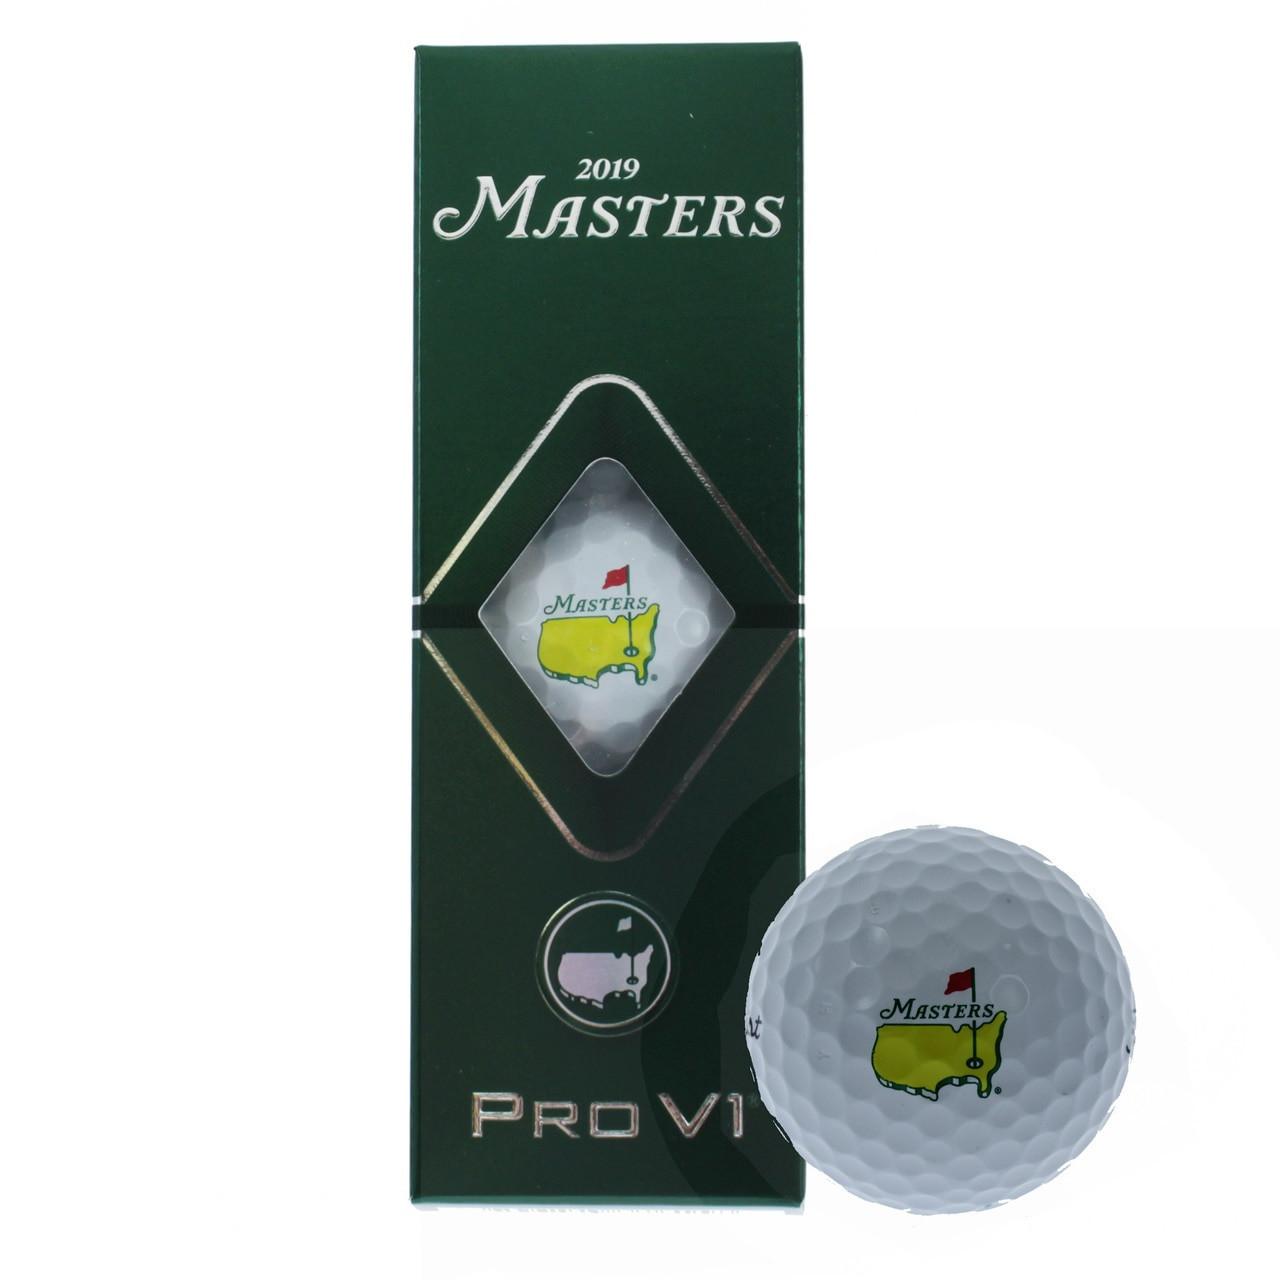 Masters Golf Balls - Pro V1 - 3 Pack 2019